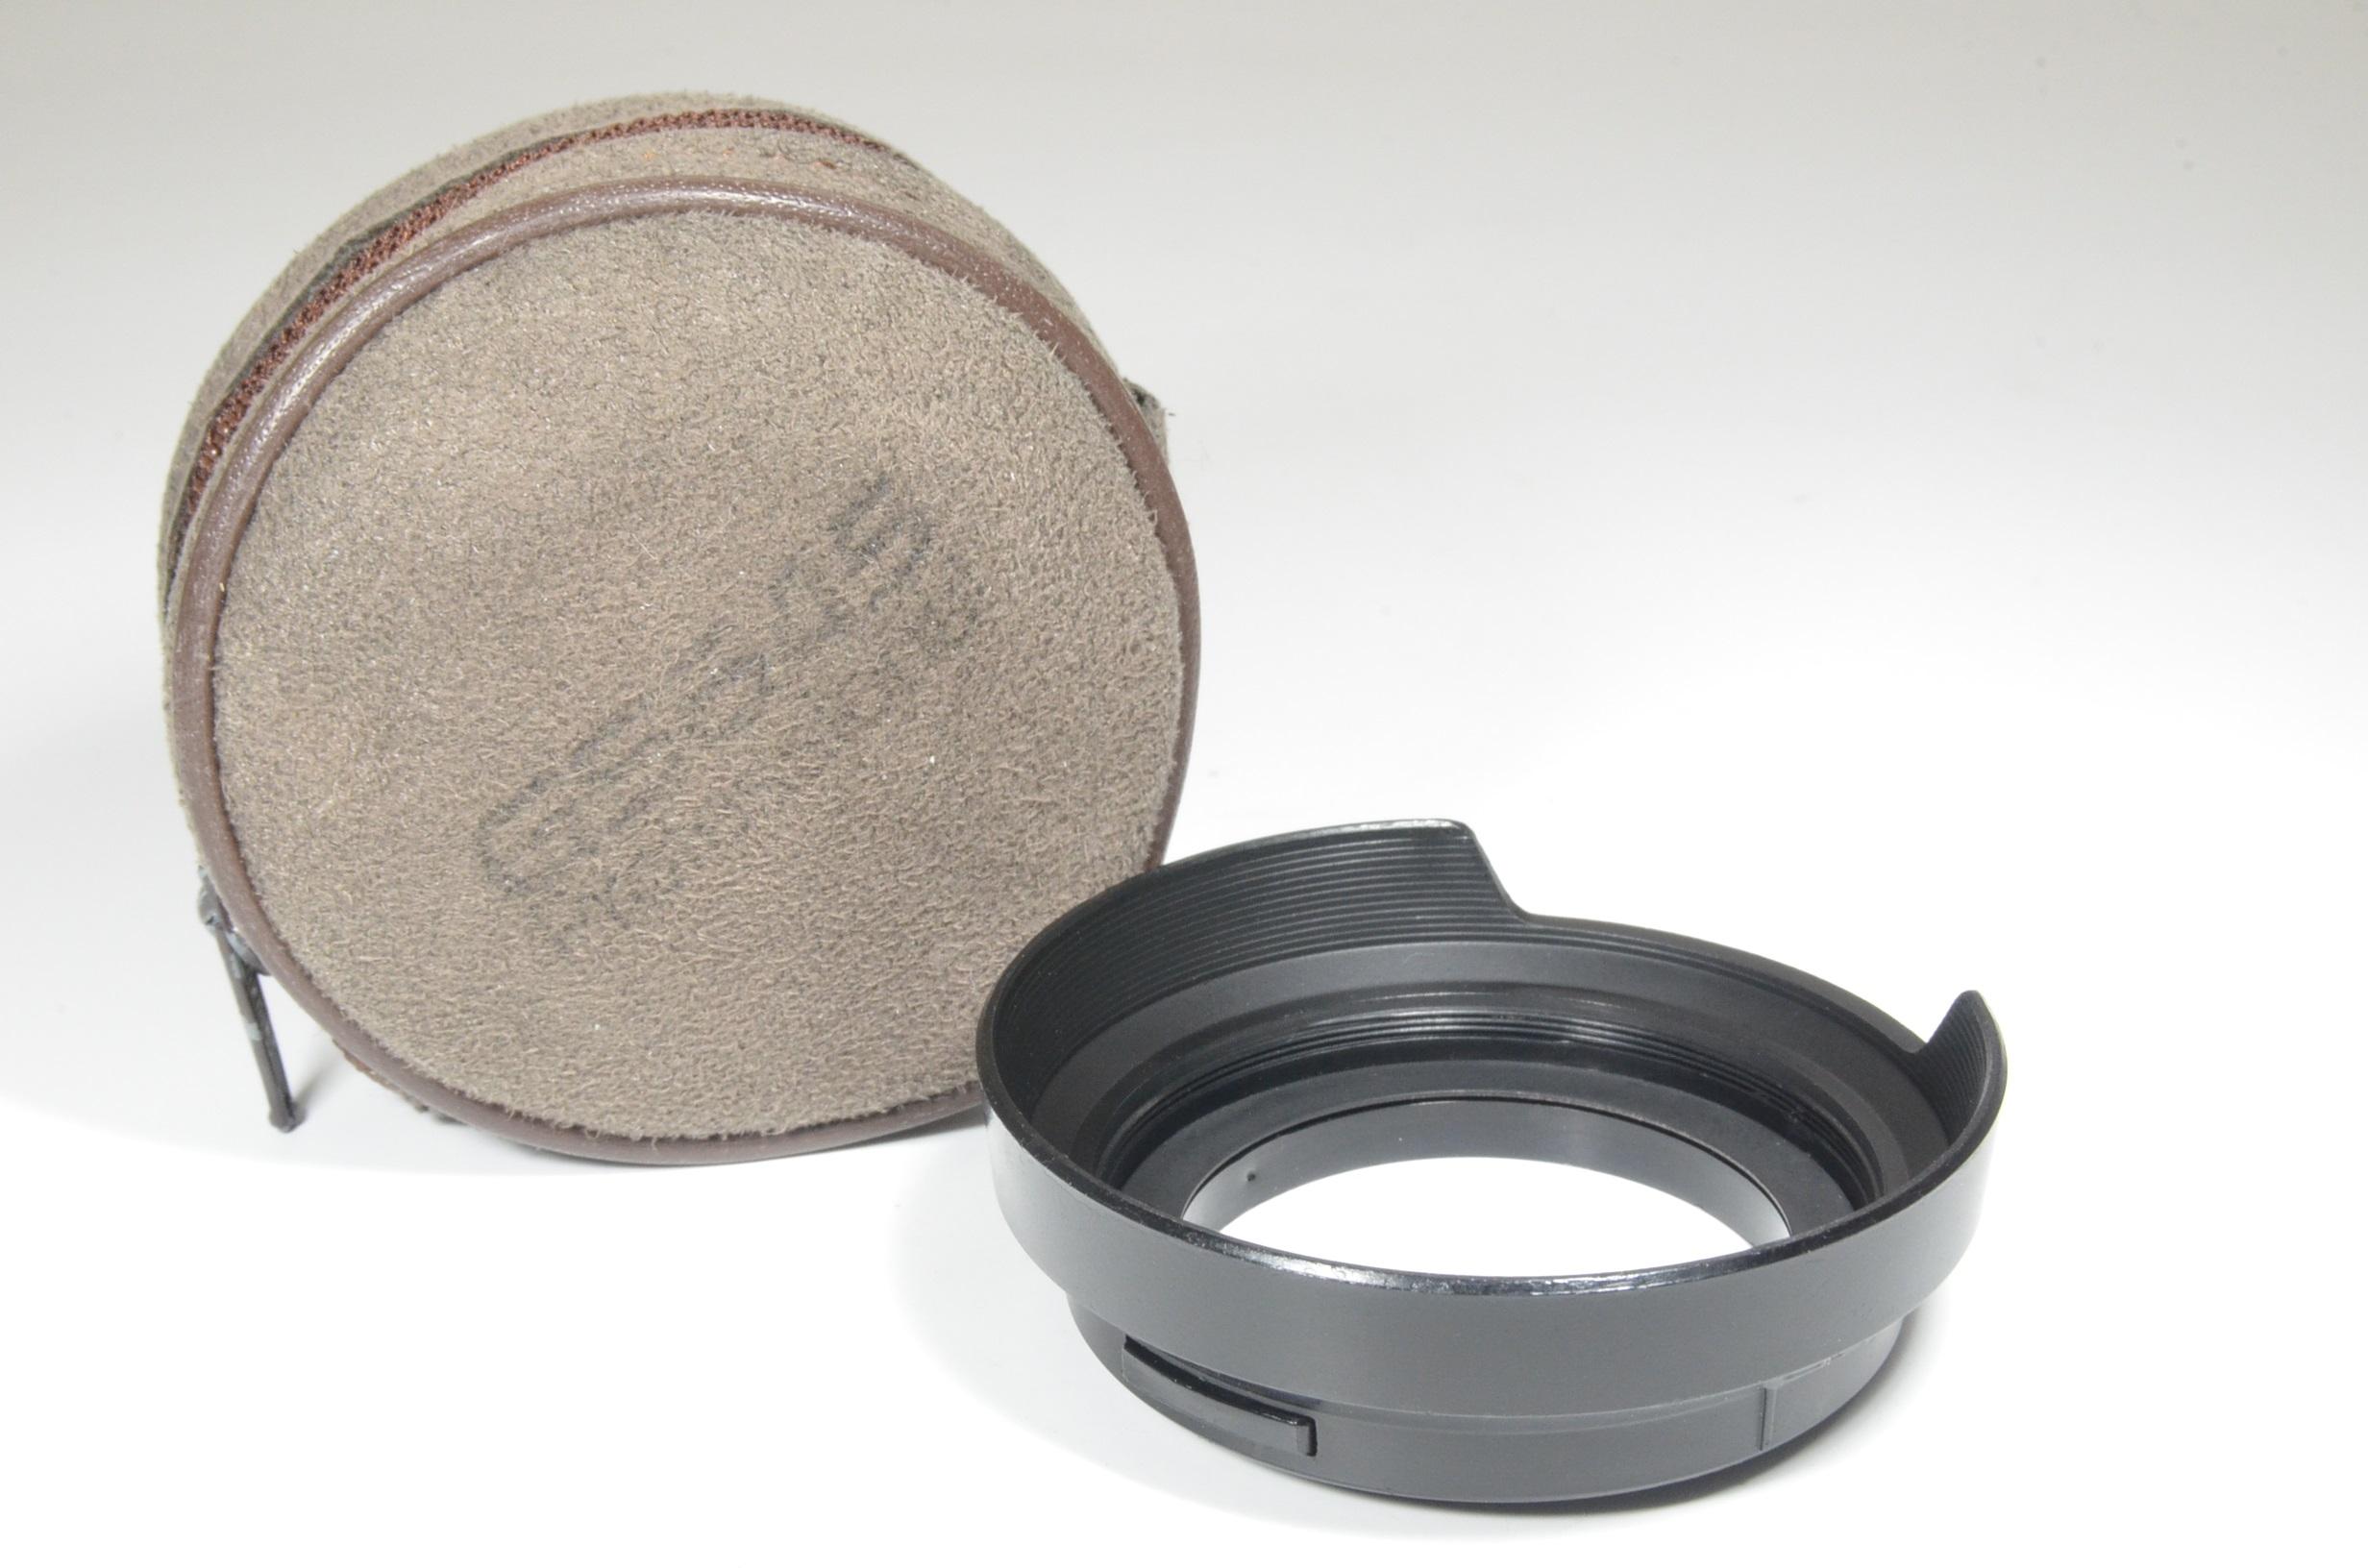 fujica fuji fujifilm lens hood for gs645 film camera